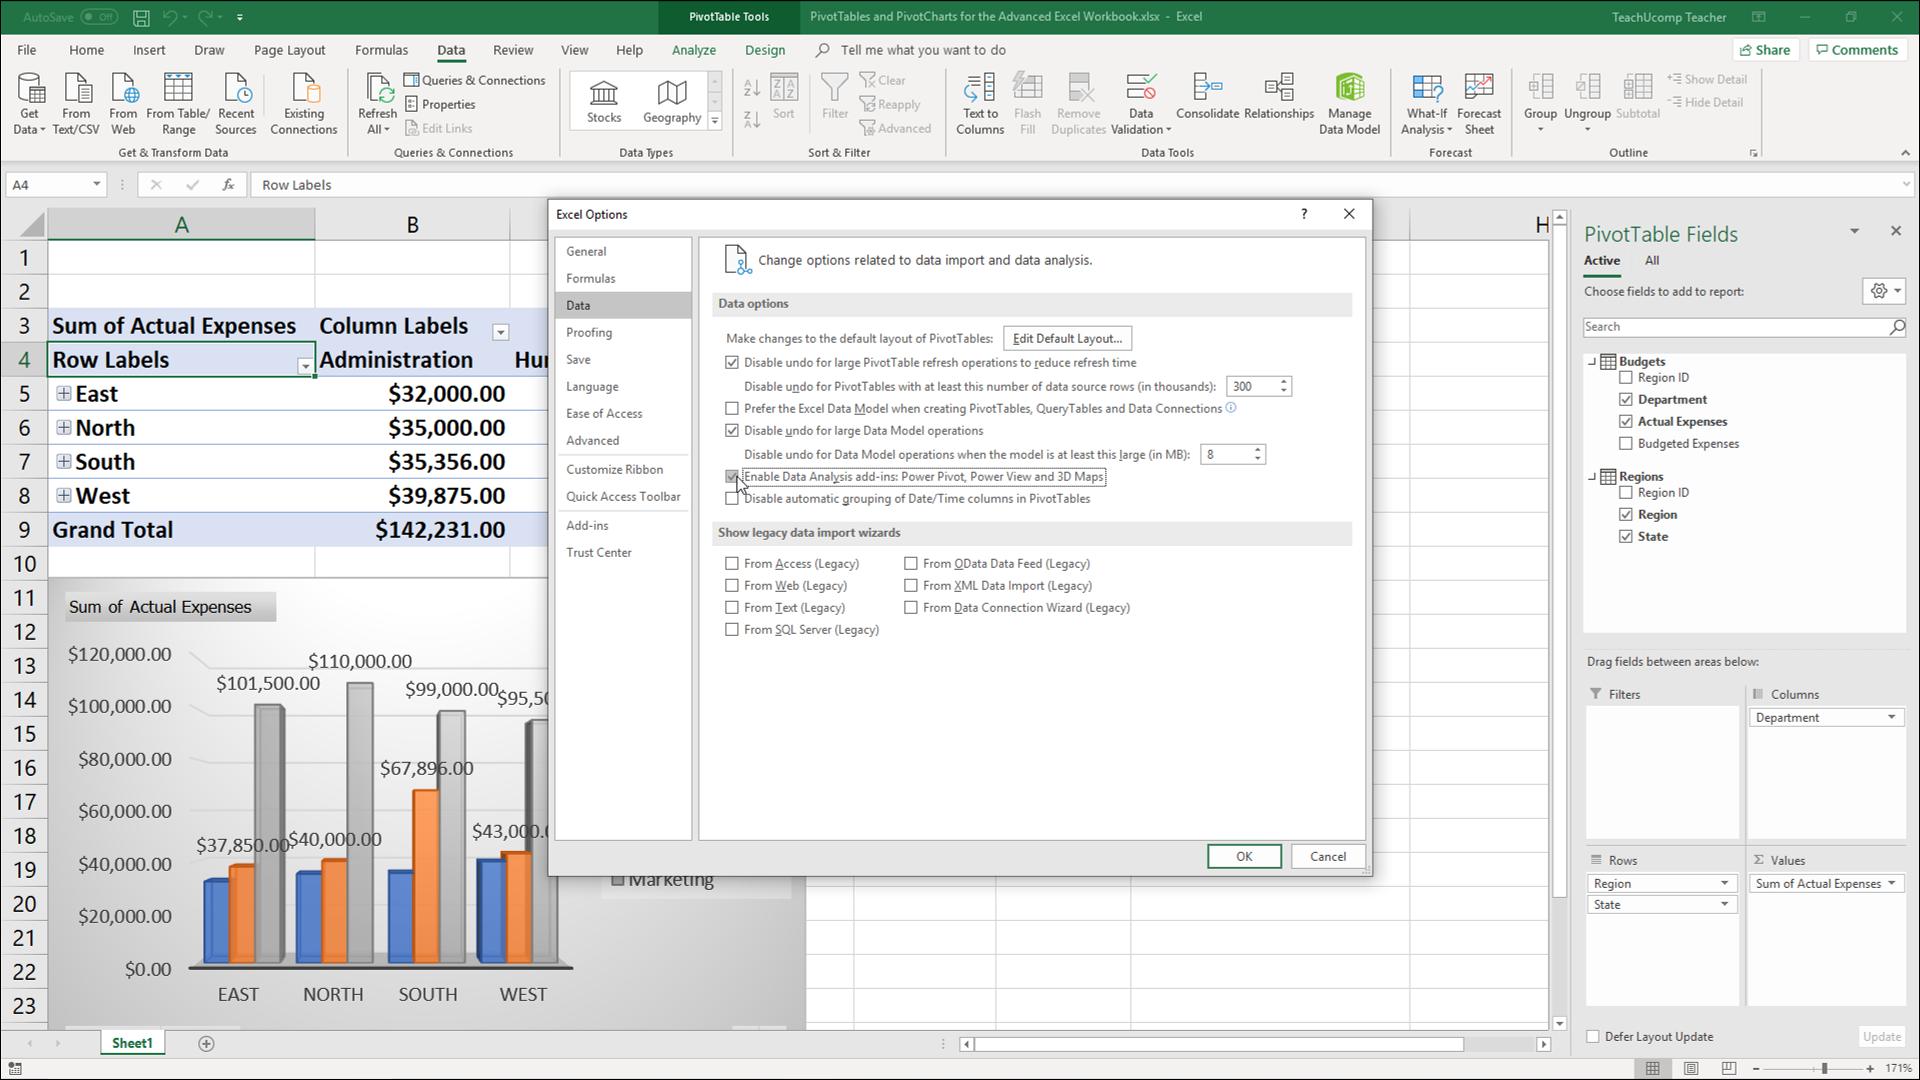 Download Microsoft Office 2019 (64-bit) for Windows 10